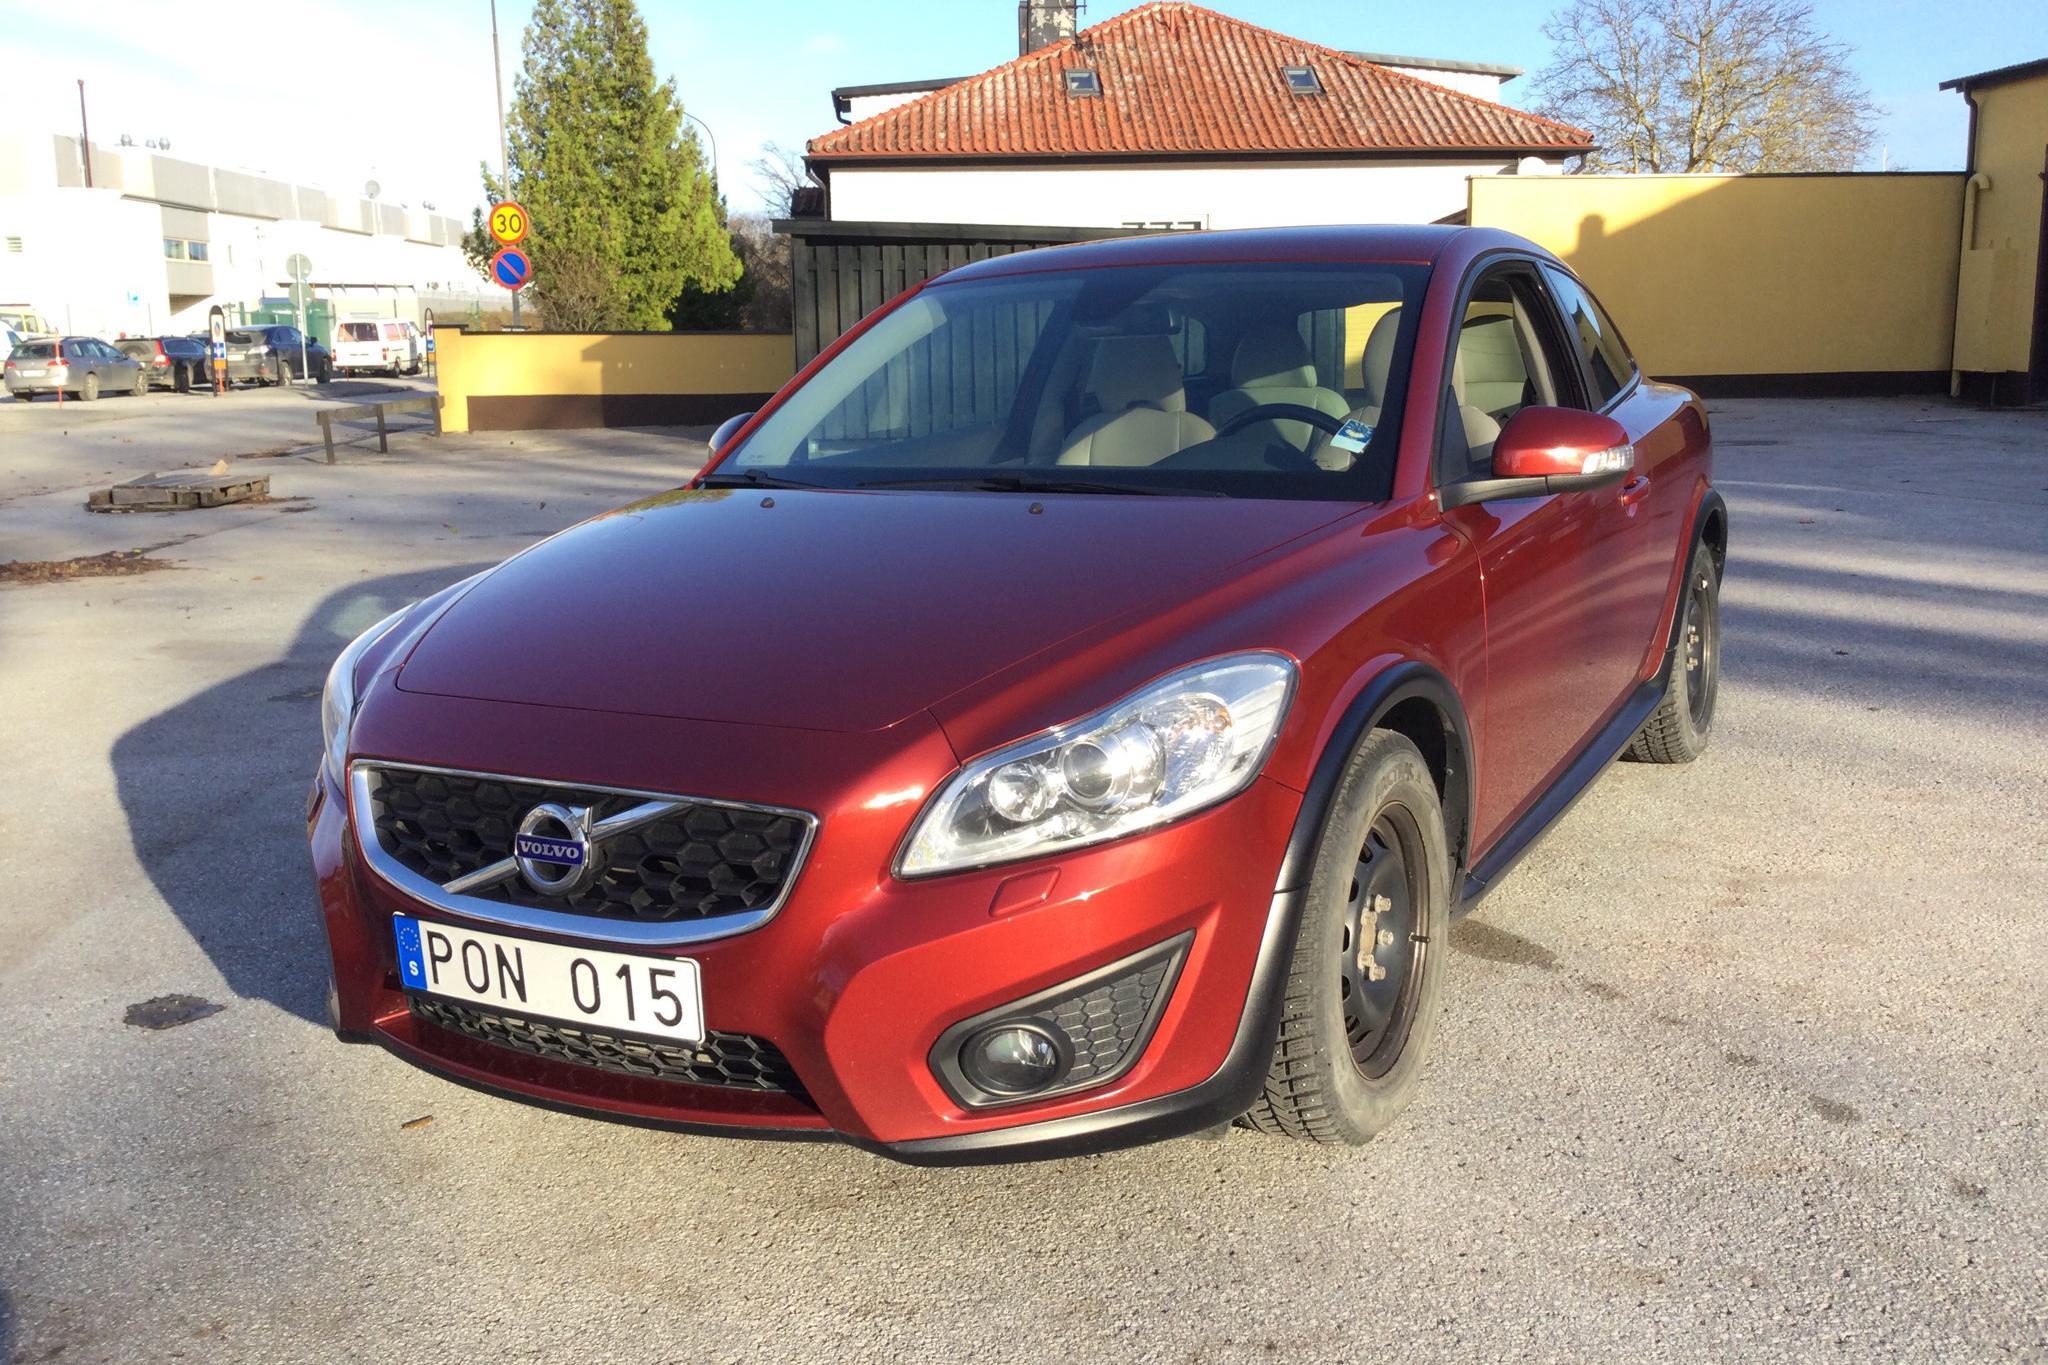 Volvo C30 1.6D DRIVe (109hk) - 106 370 km - Manual - red - 2011